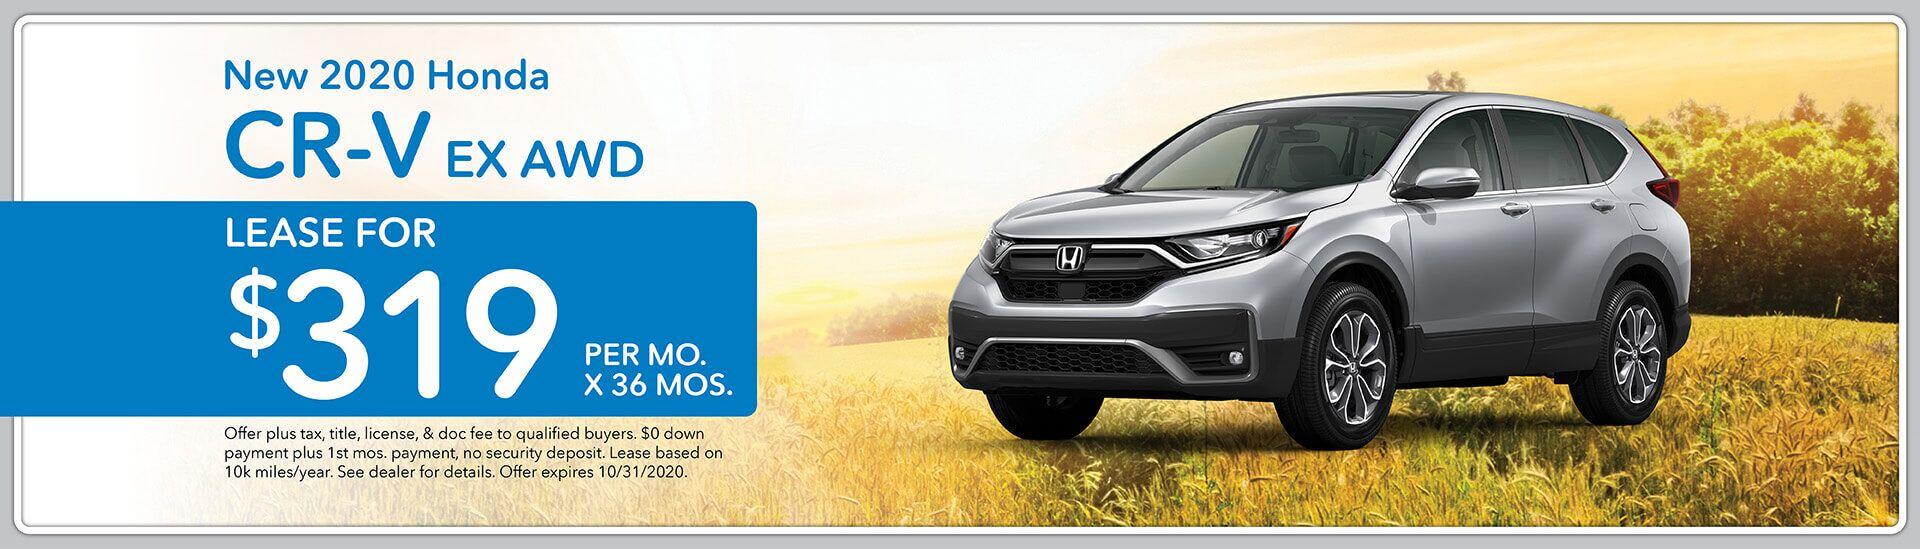 2020 Honda CR-V EX AWD, Lease for $319/mo. for 36 mos.   Green Bay, WI